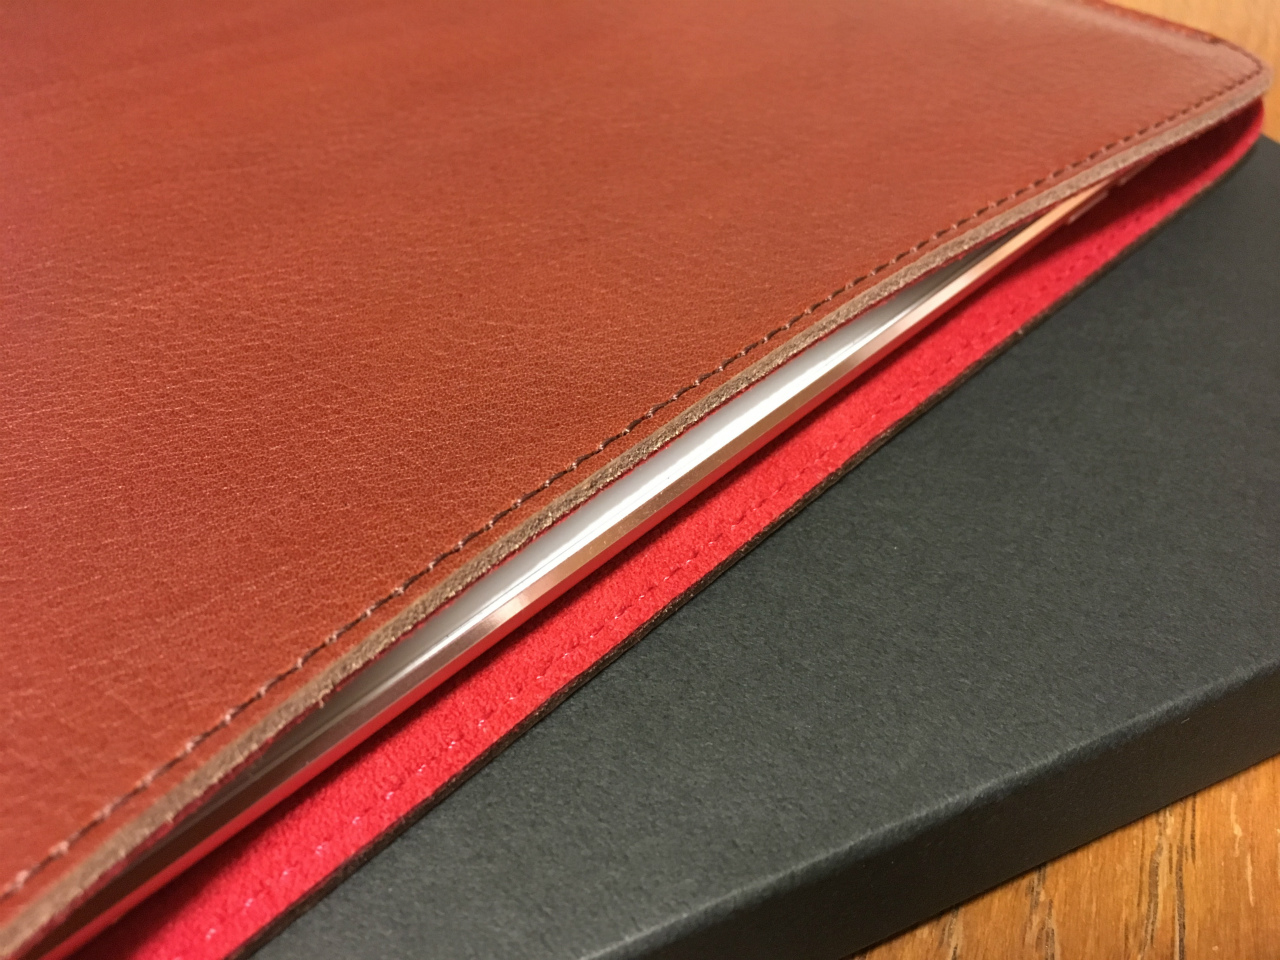 kunitachi-leather-sleeve-for-ipadpro-06